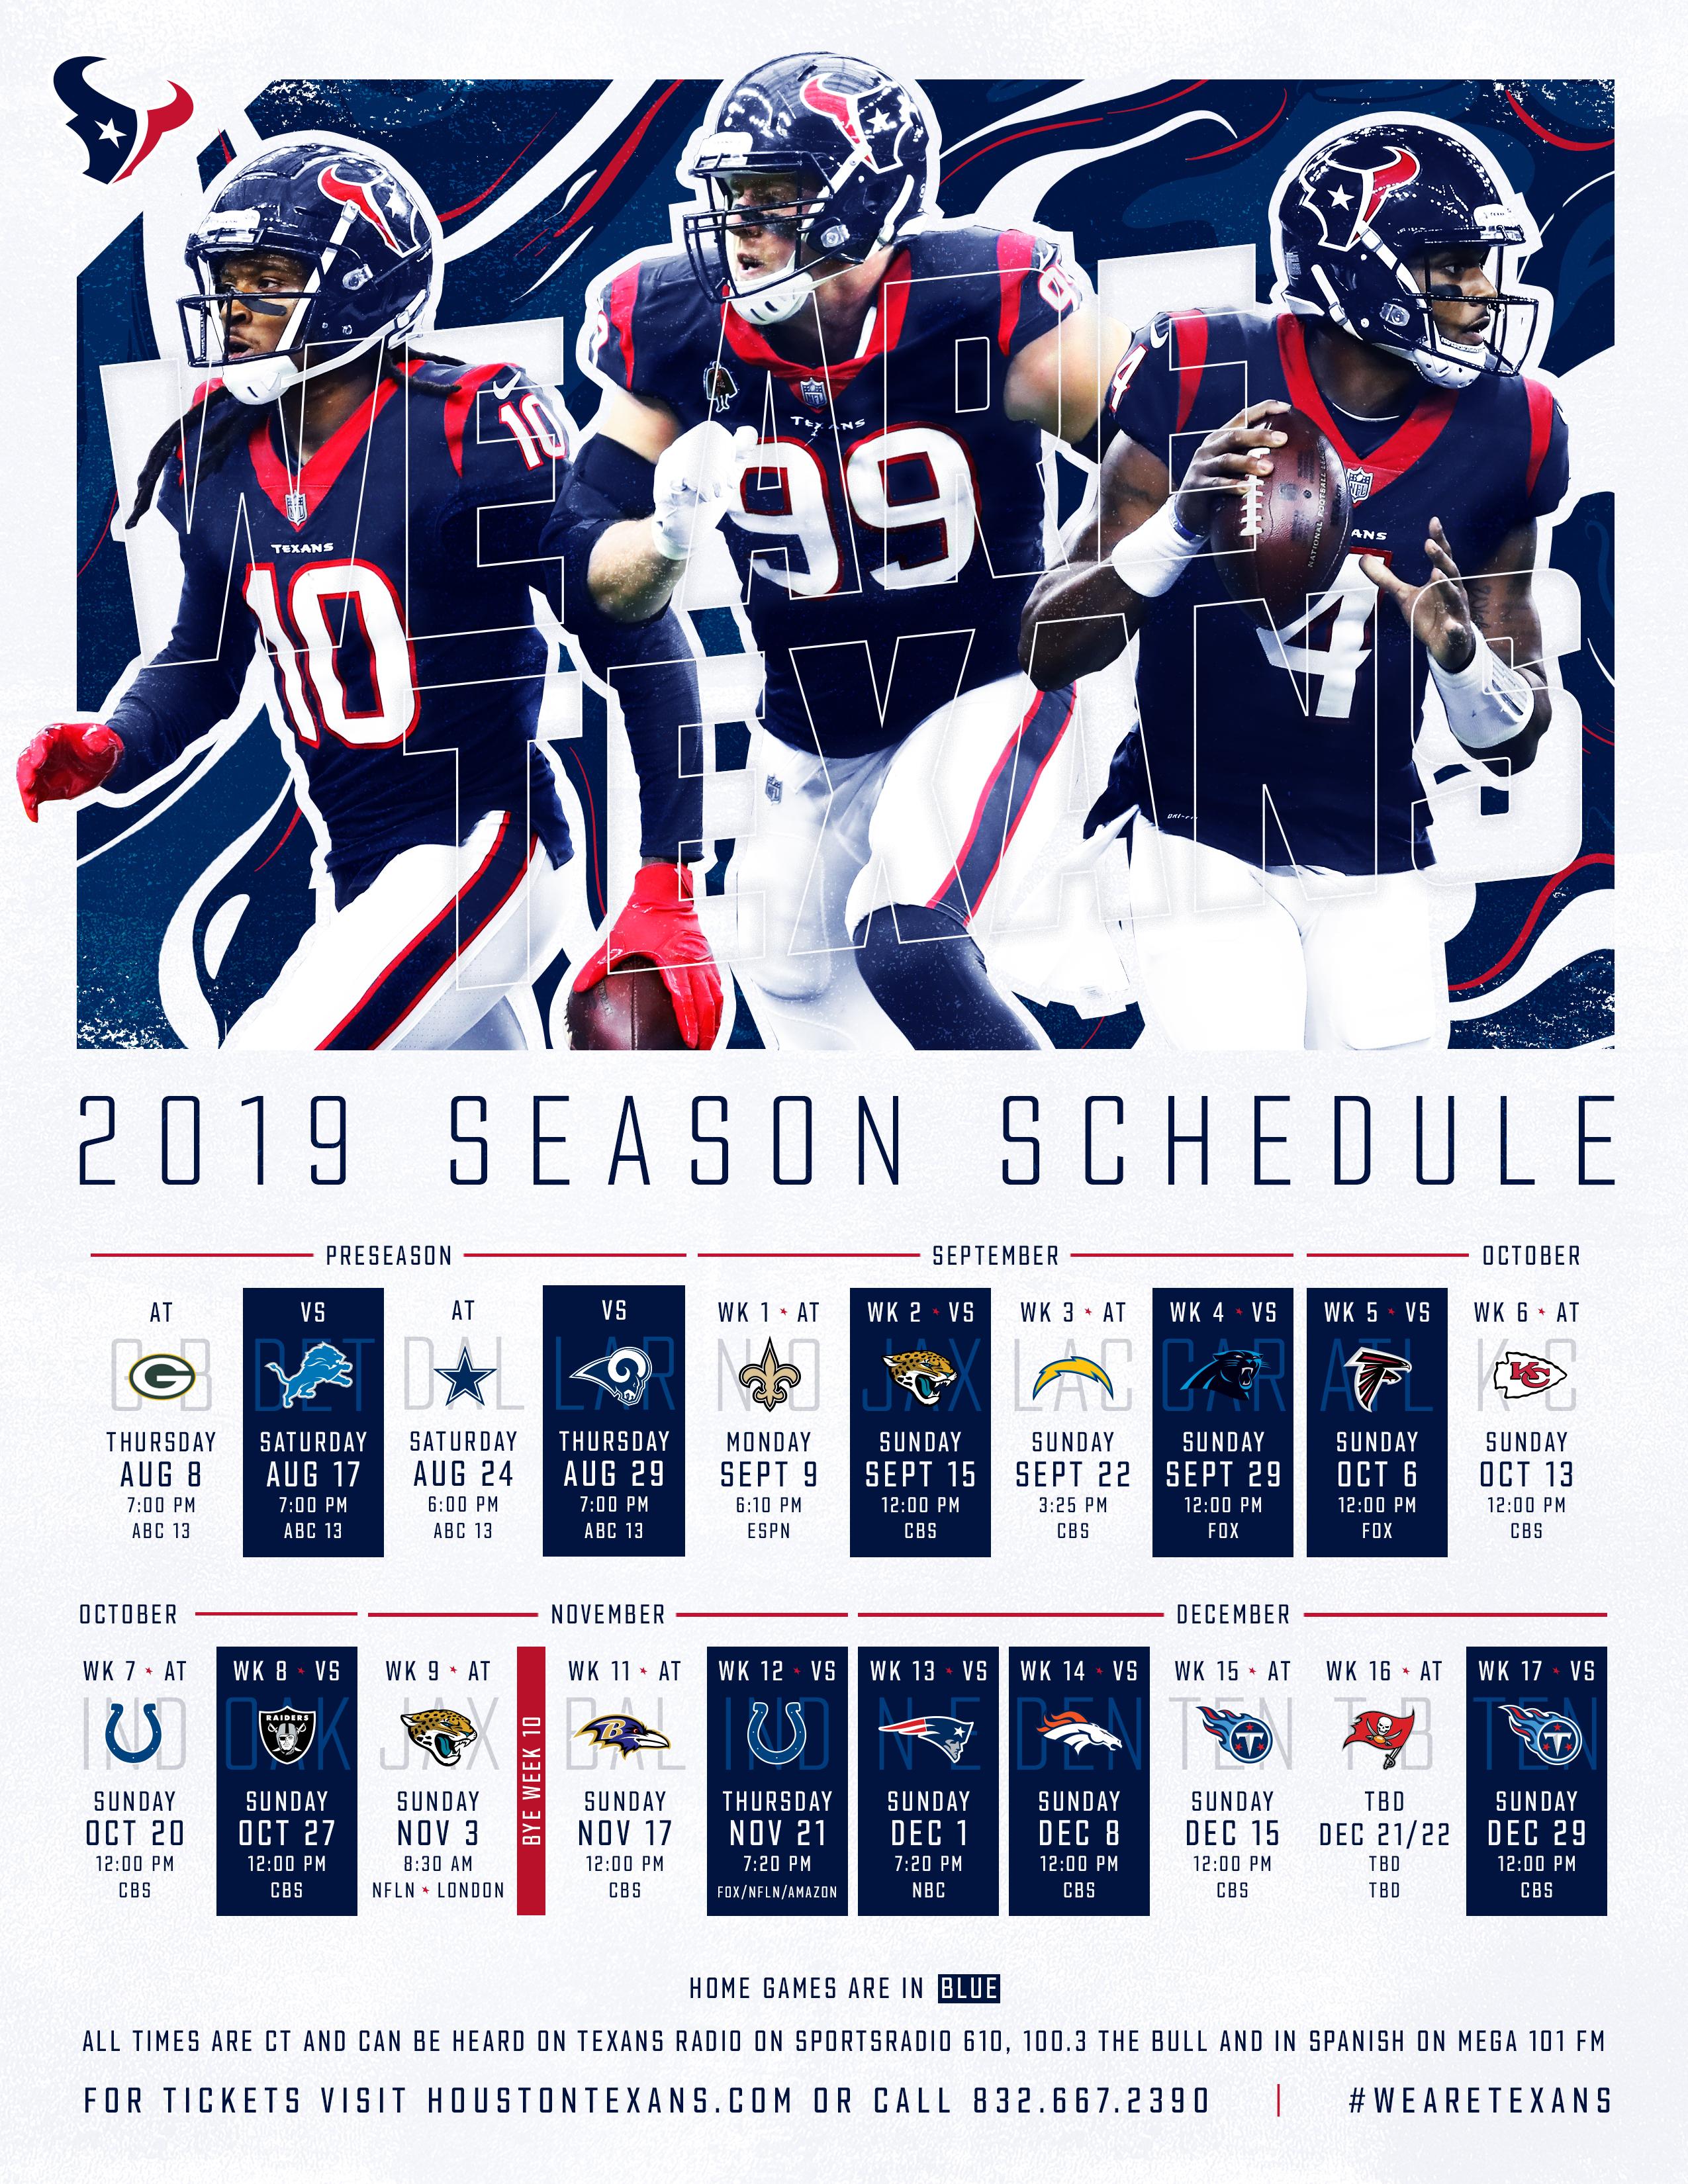 Texans Schedule | Houston Texans - Houstontexans